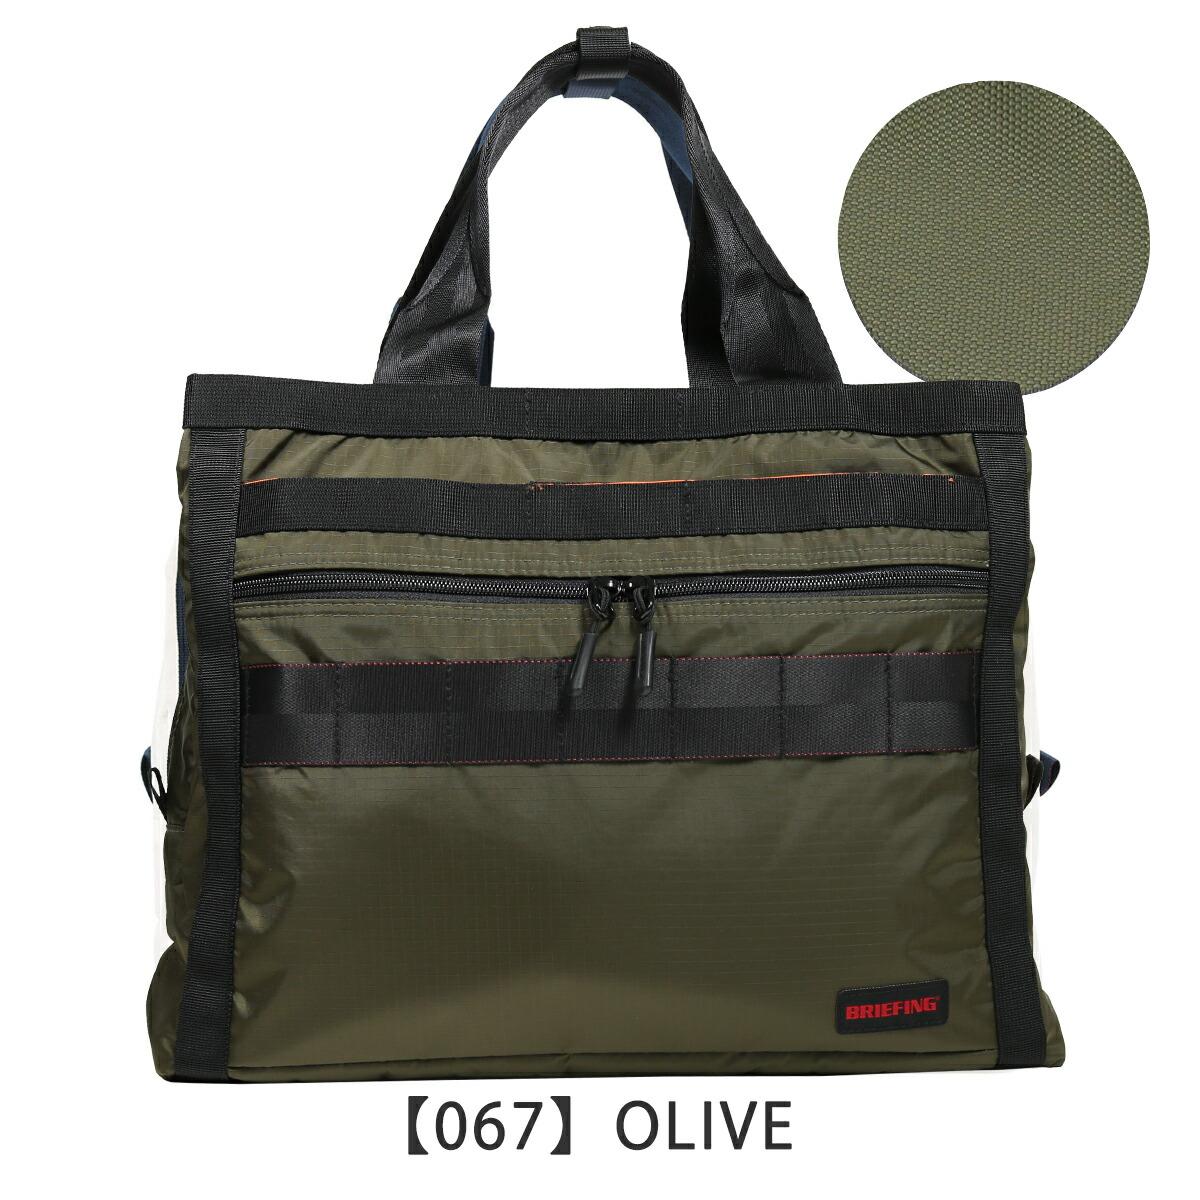 【067】OLIVE